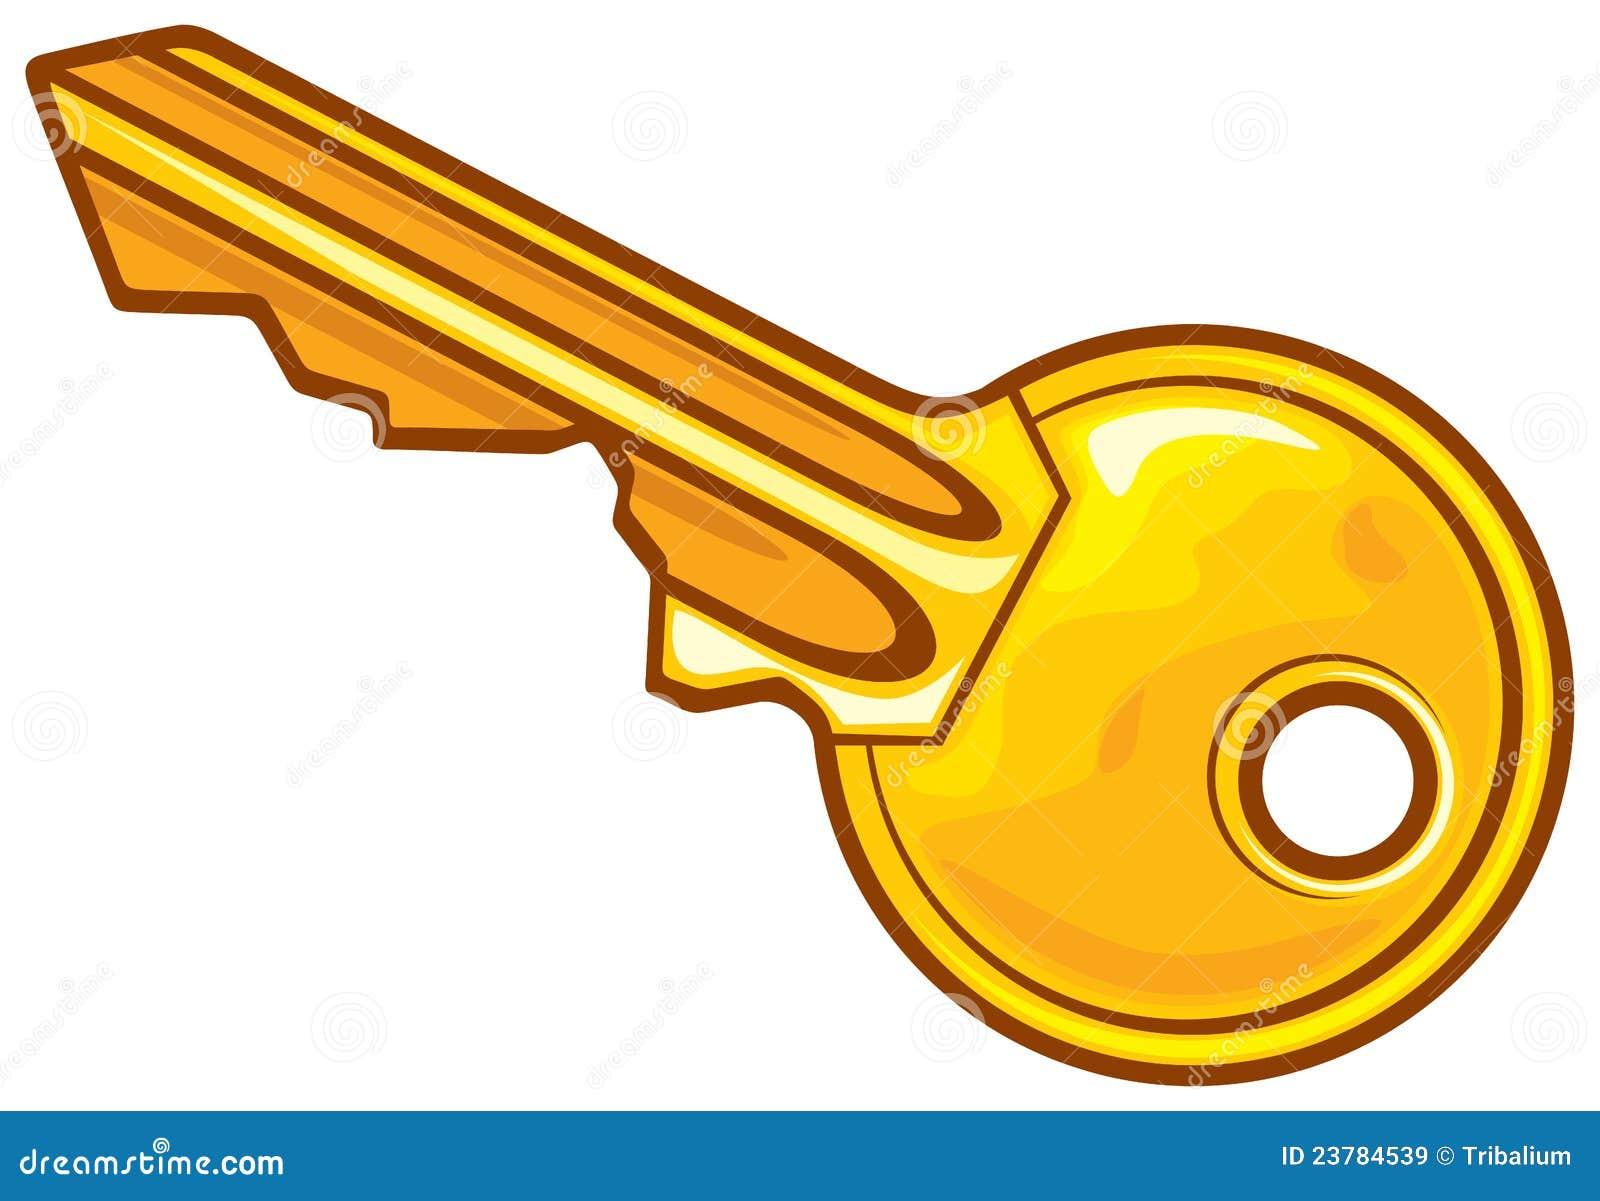 Vector Key Illustration: Vector Illustration Royalty Free Stock Images